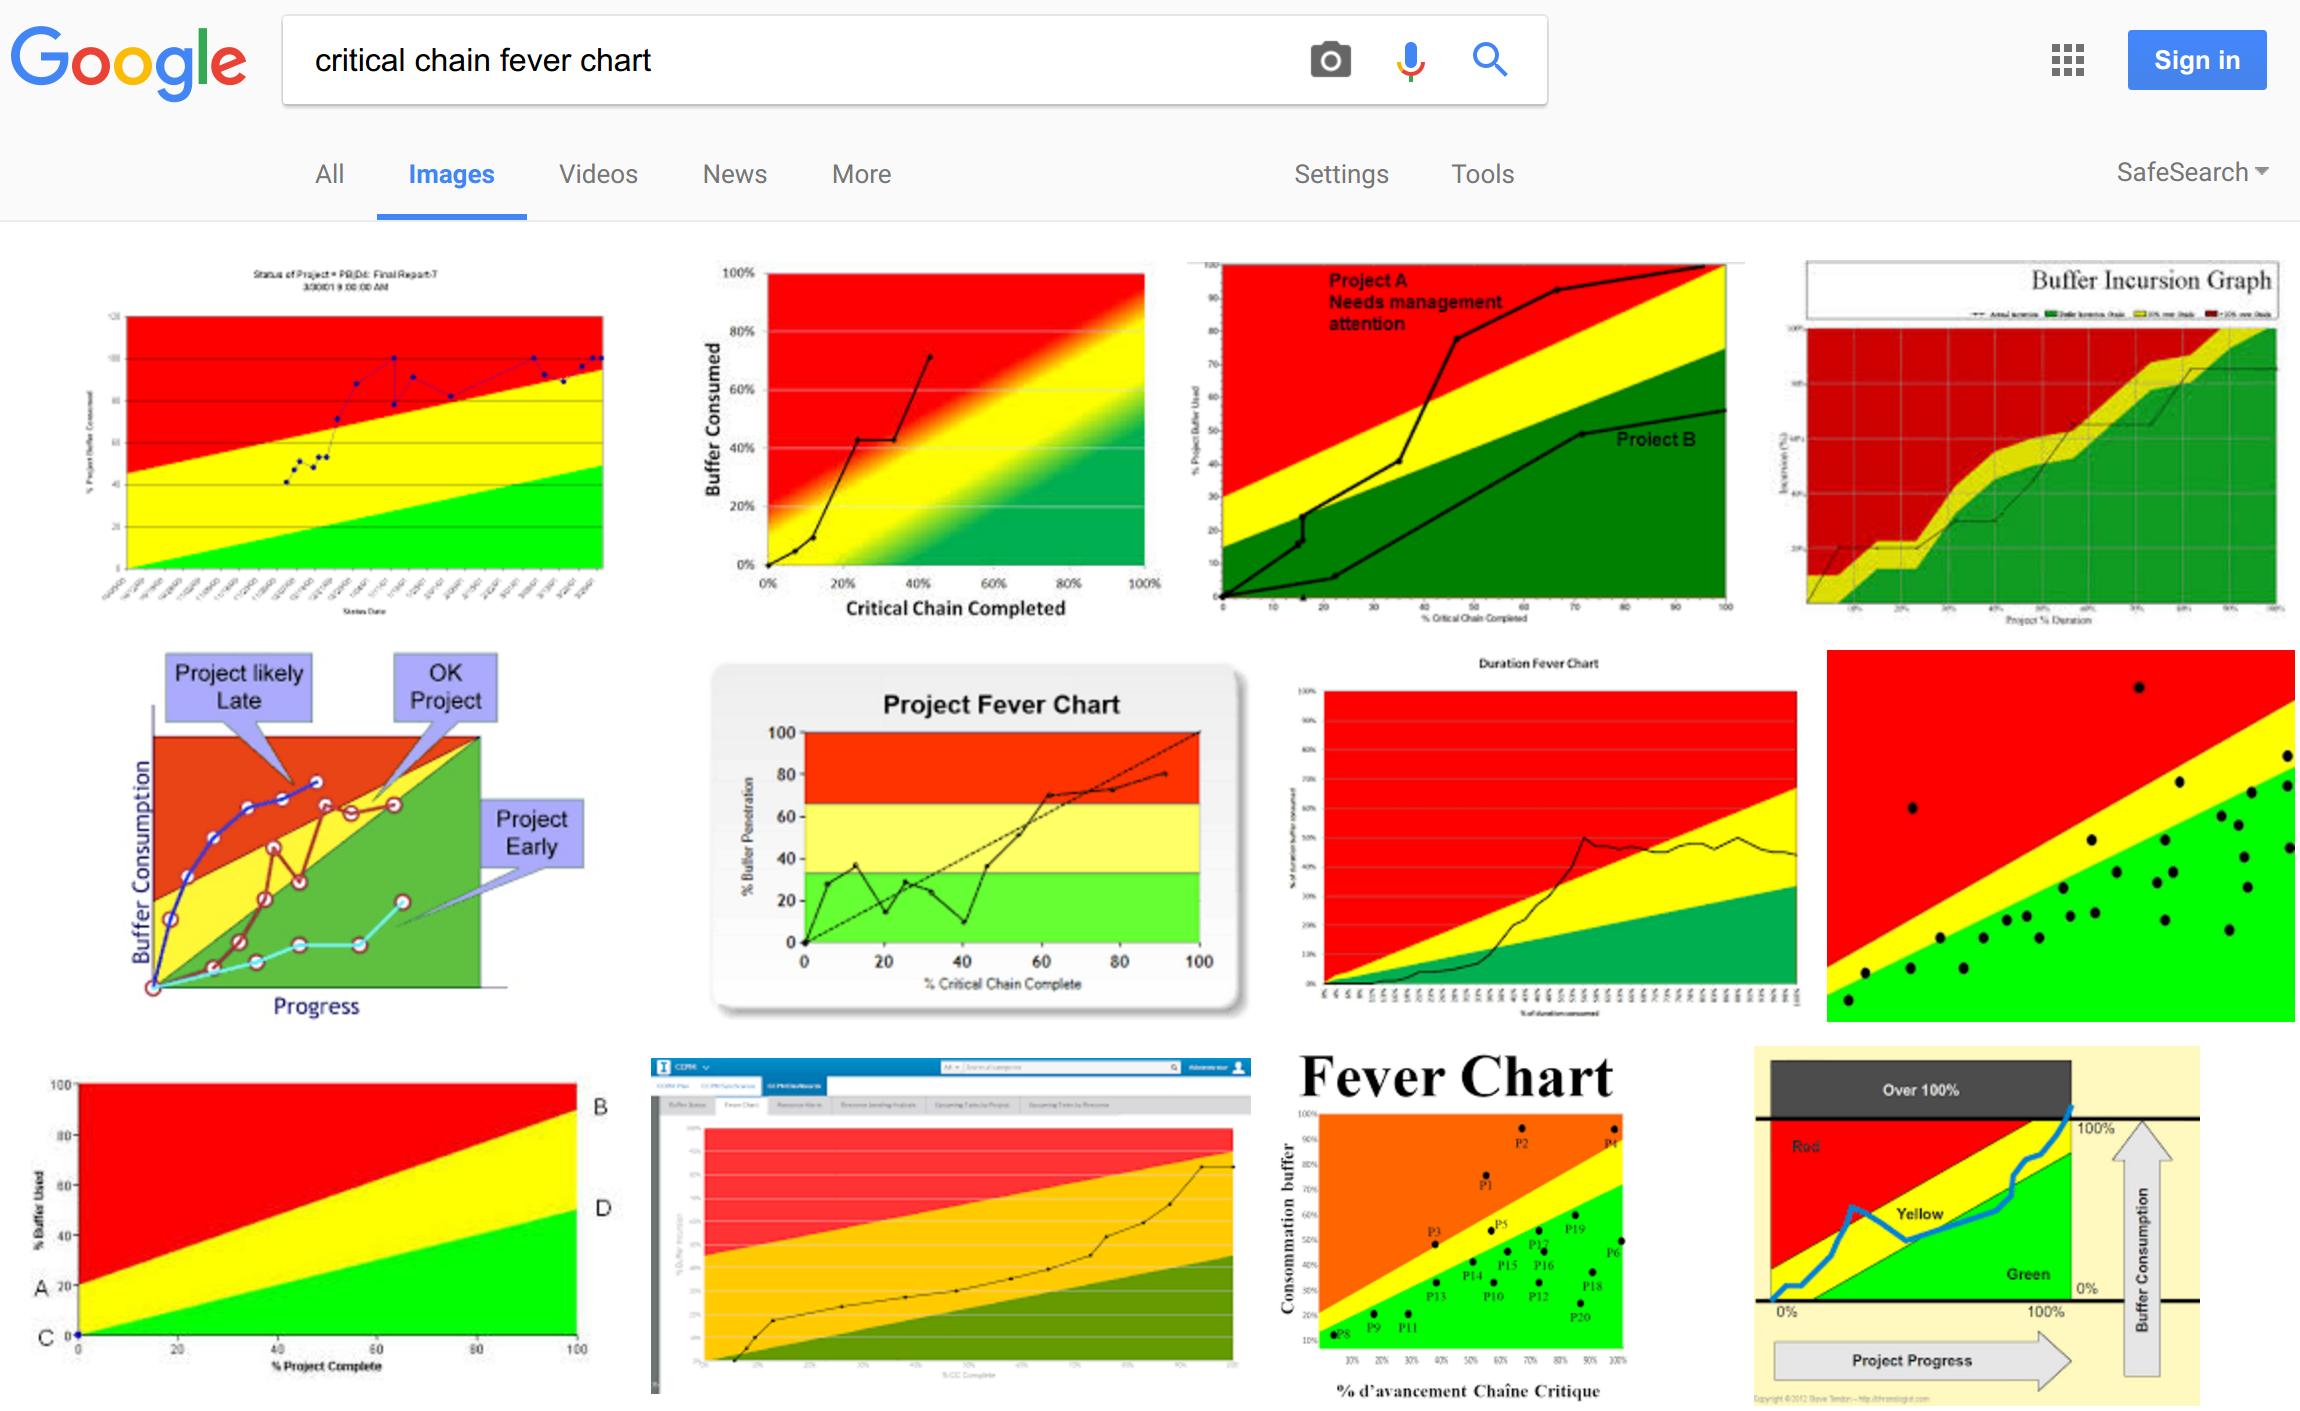 The fever chart Custom paper Help